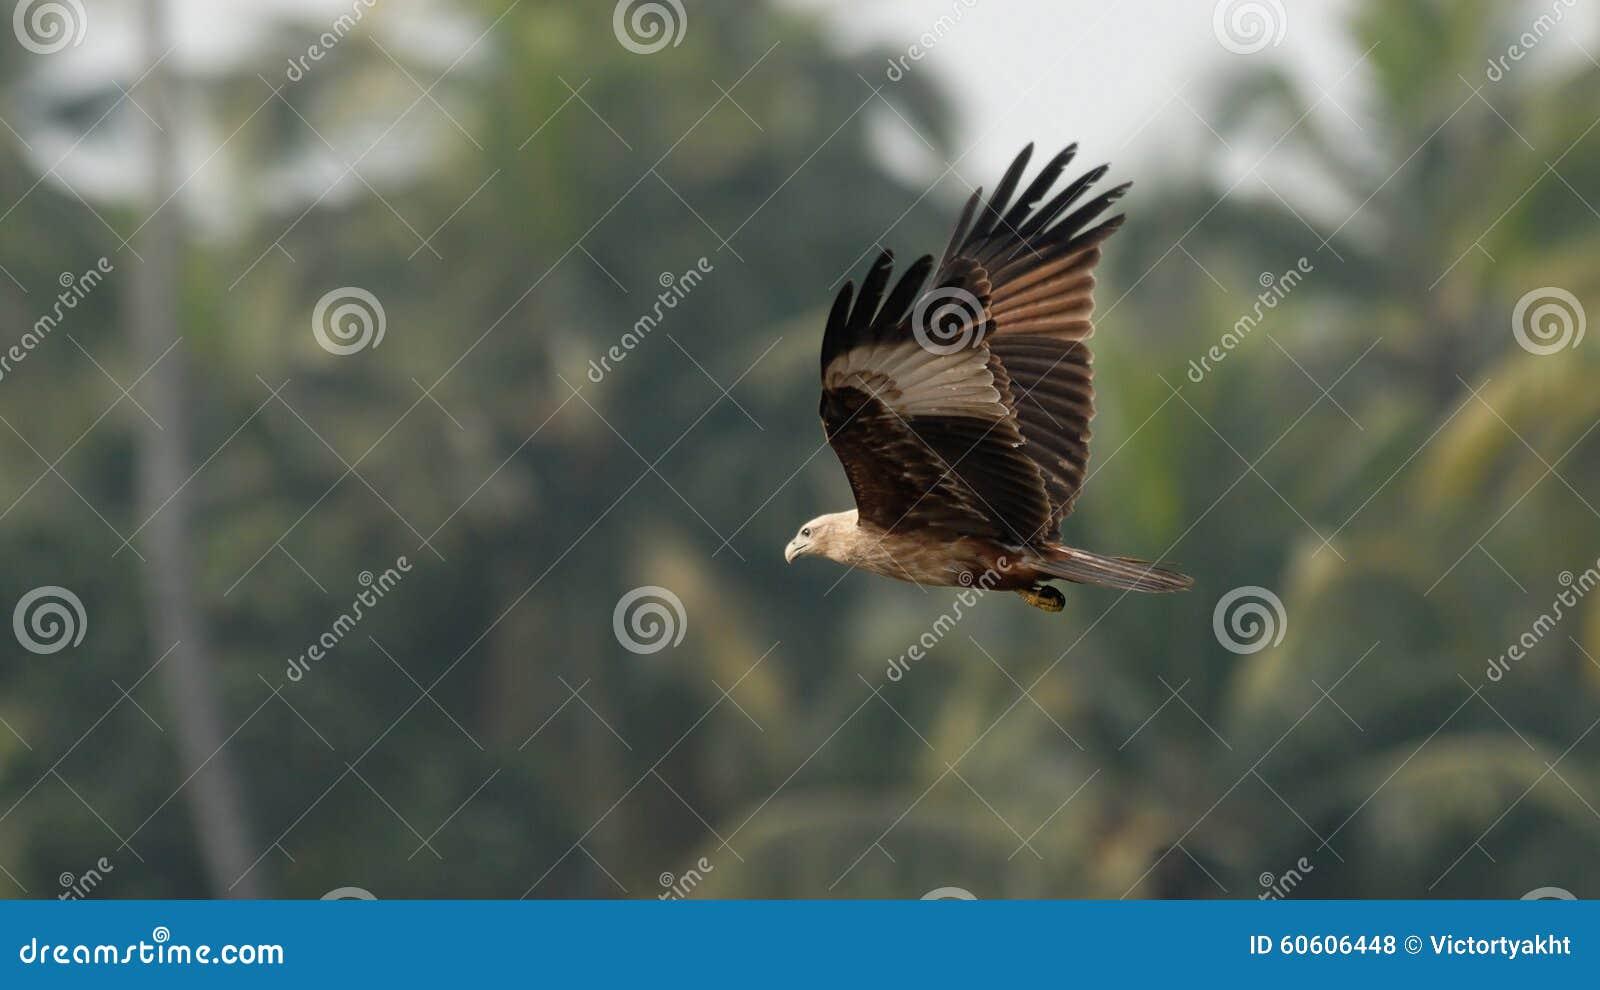 Flying Black Kite at palms background